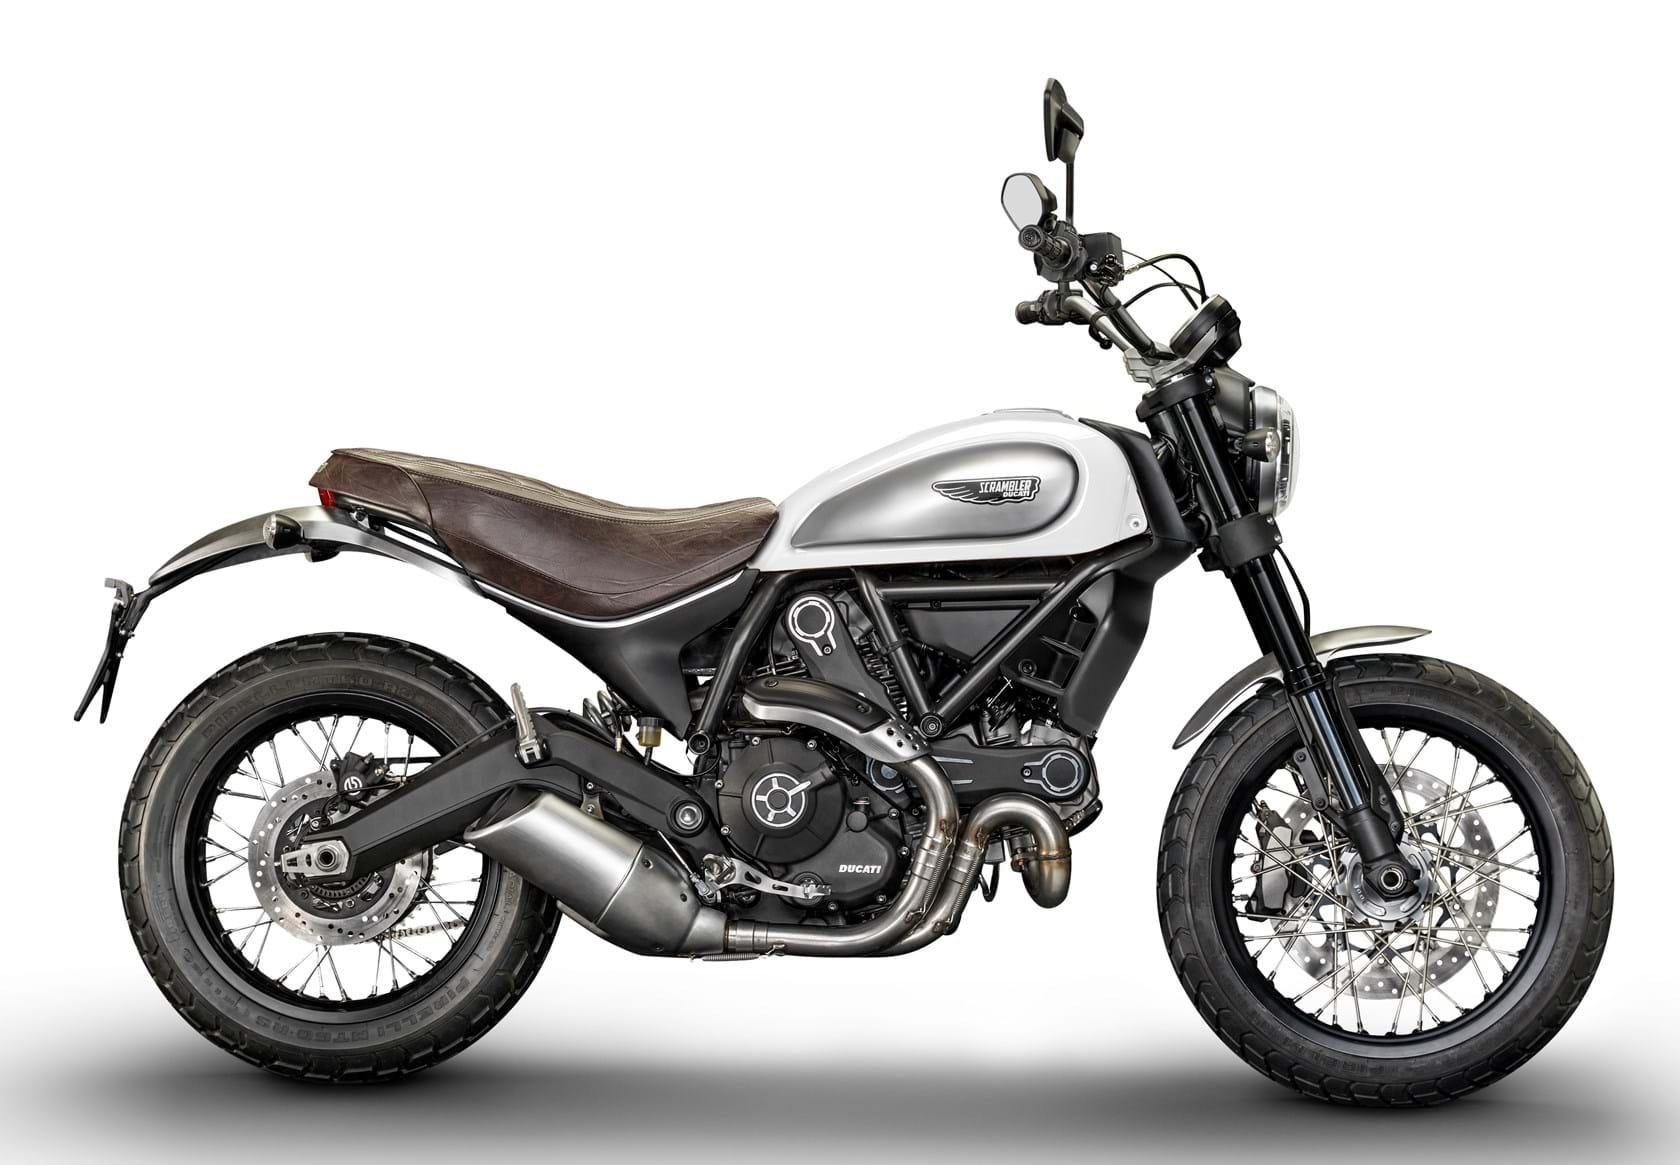 Ducati Scrambler Classic Review • For Sale • Price Guide • The Bike ...